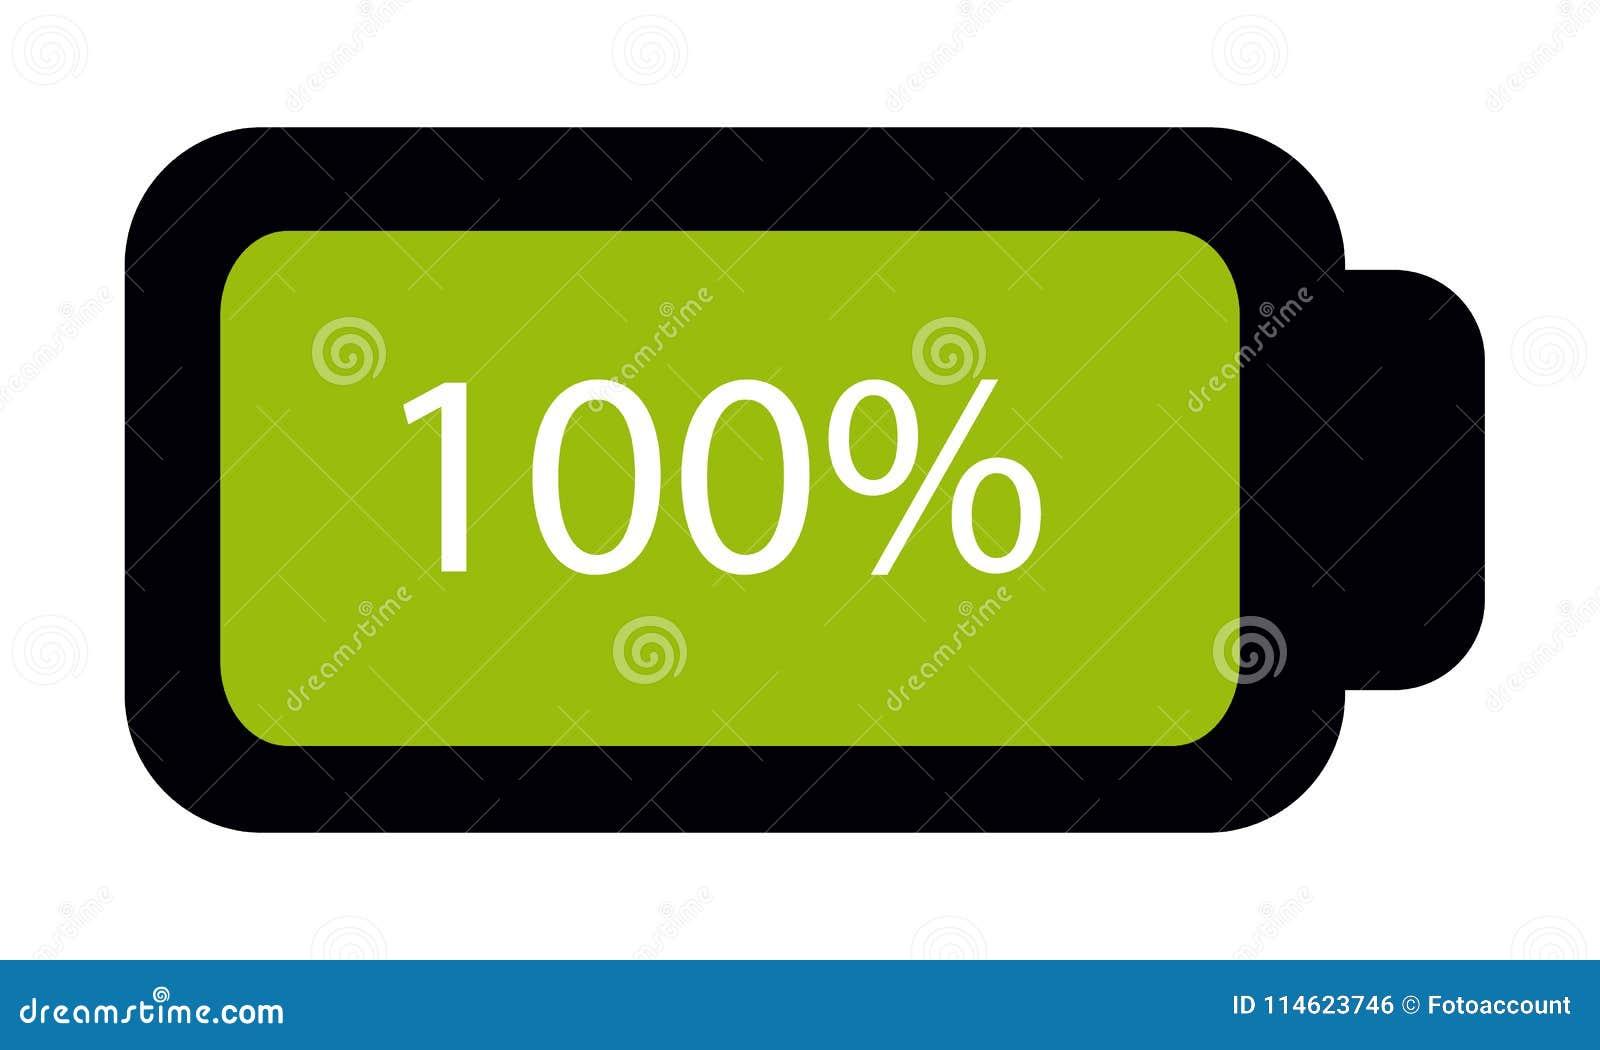 Batterie-Status voll 100  - Editable Vektor-Ikone - lokalisiert auf Weiß